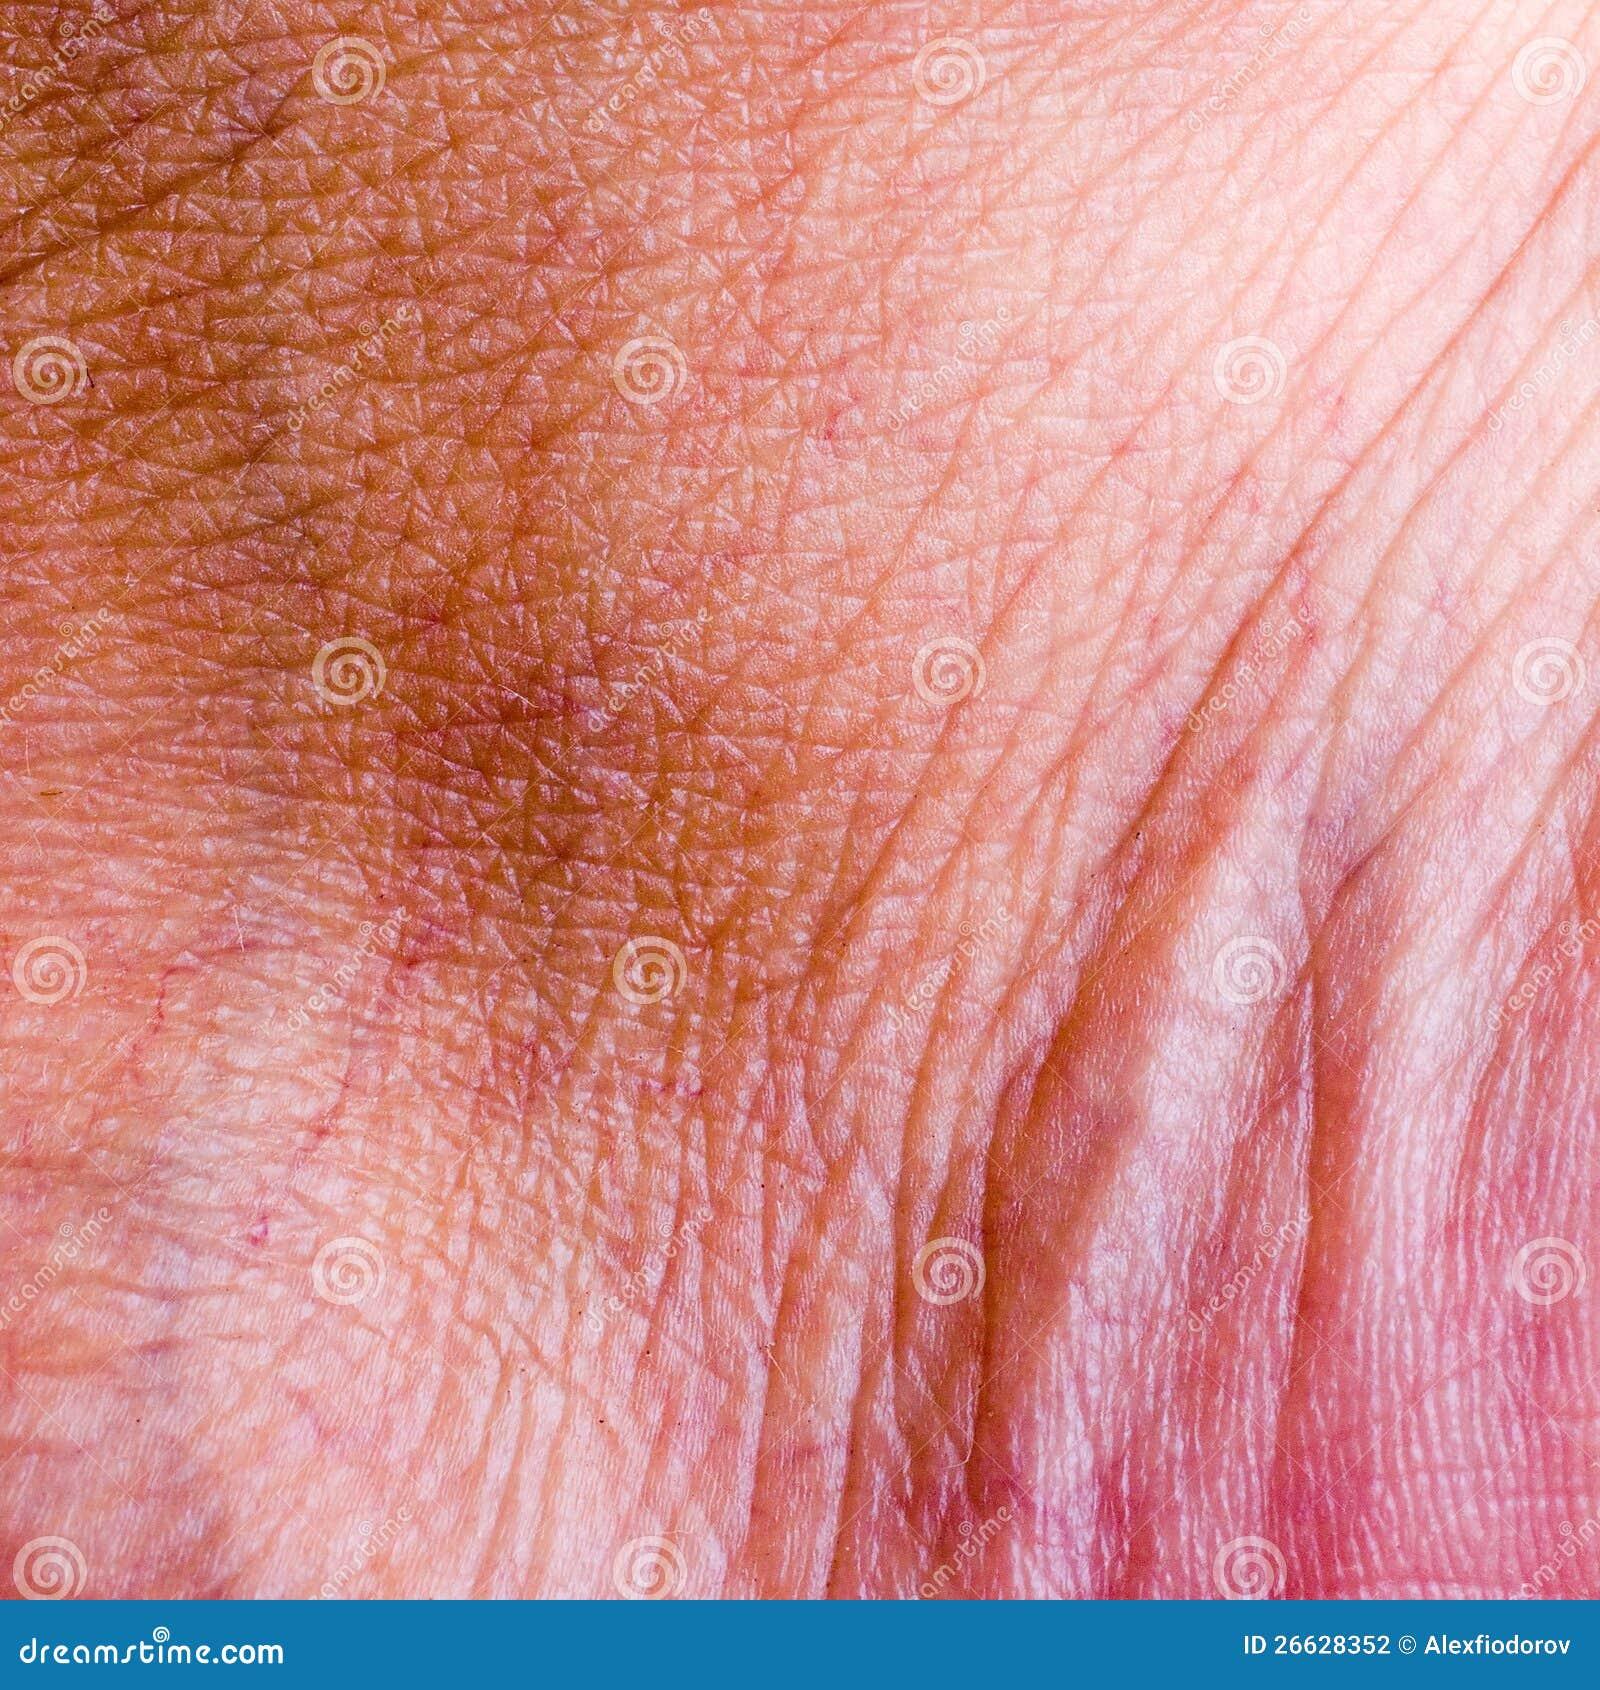 human skin background stock image image of melanoma 61054117 human skin closeup background stock photo image 26628352